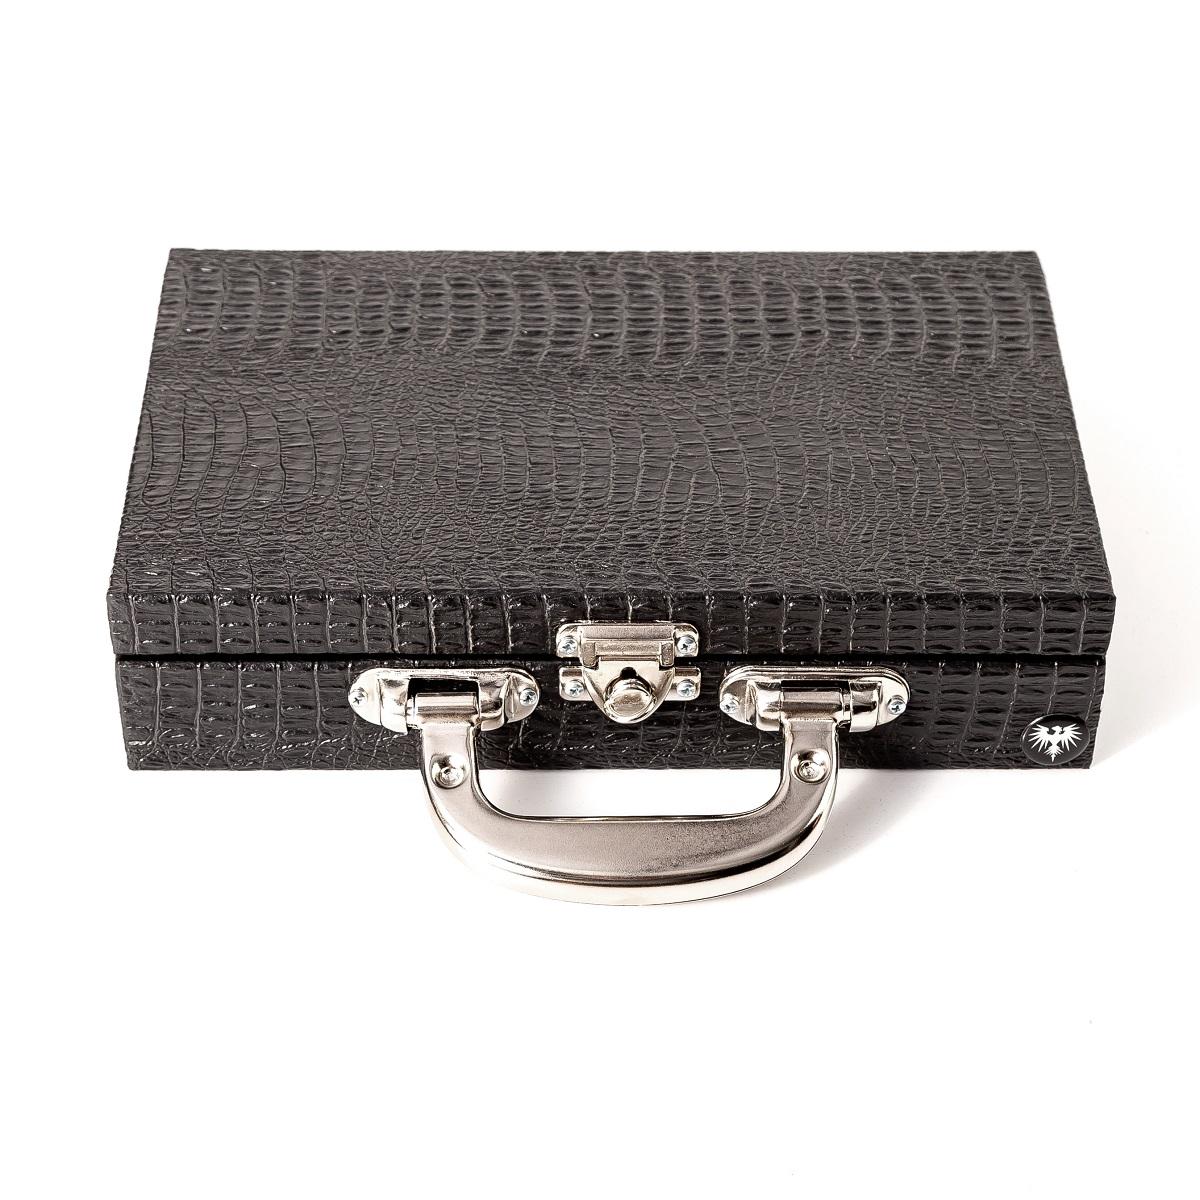 maleta-porta-joias-couro-ecologico-pequeno-preto-preto-imagem-4.jpg